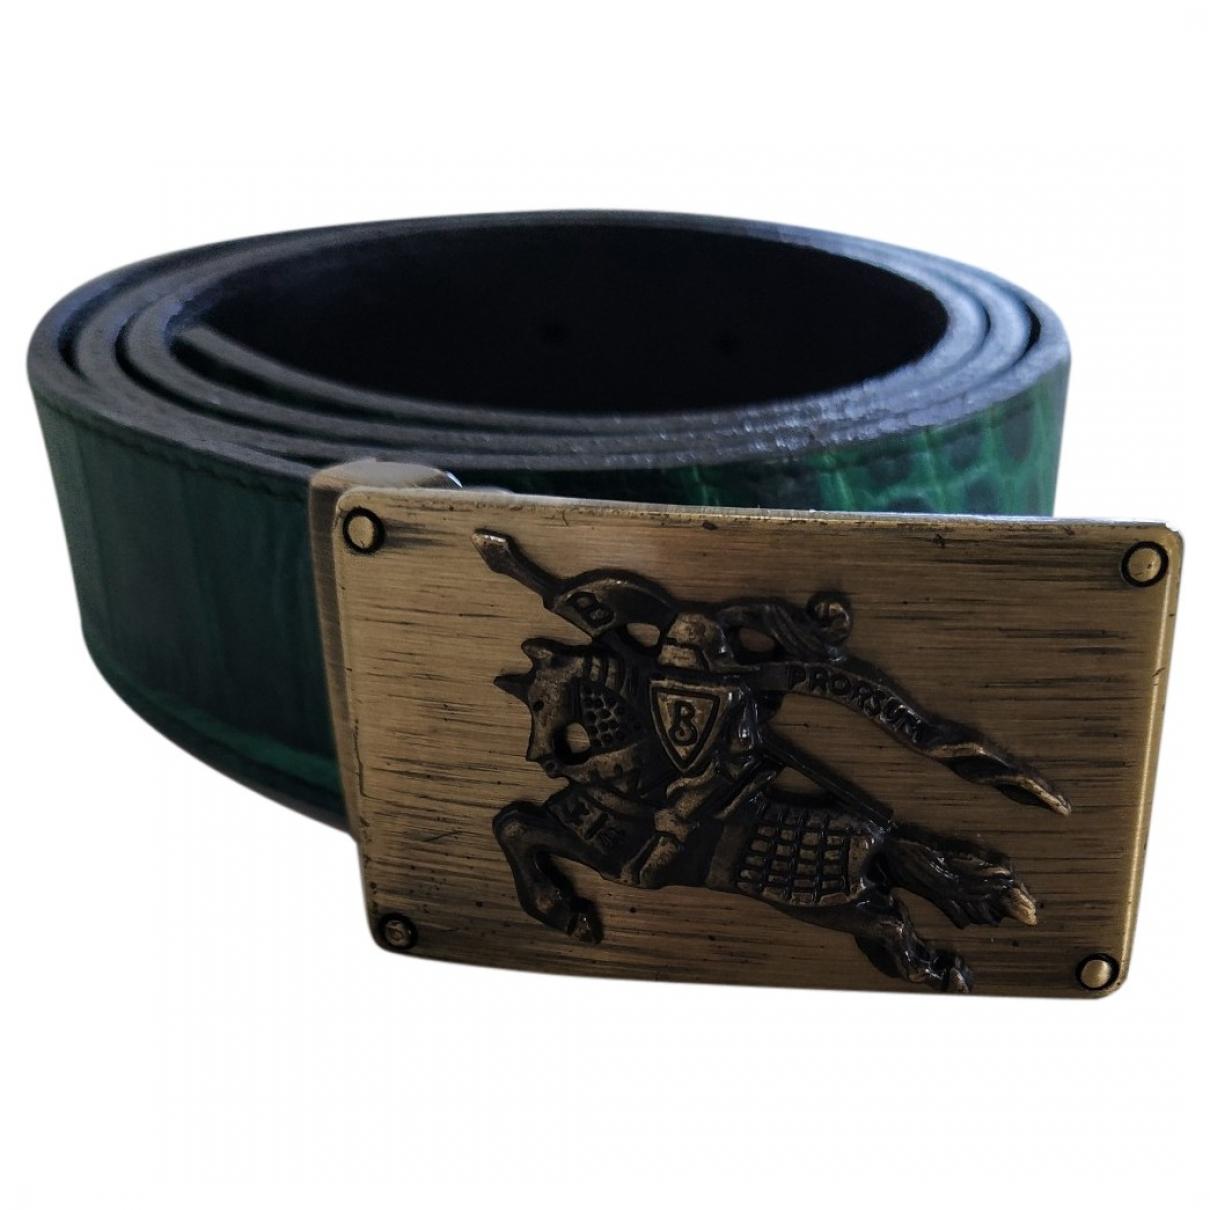 Cinturon de Cuero Burberry